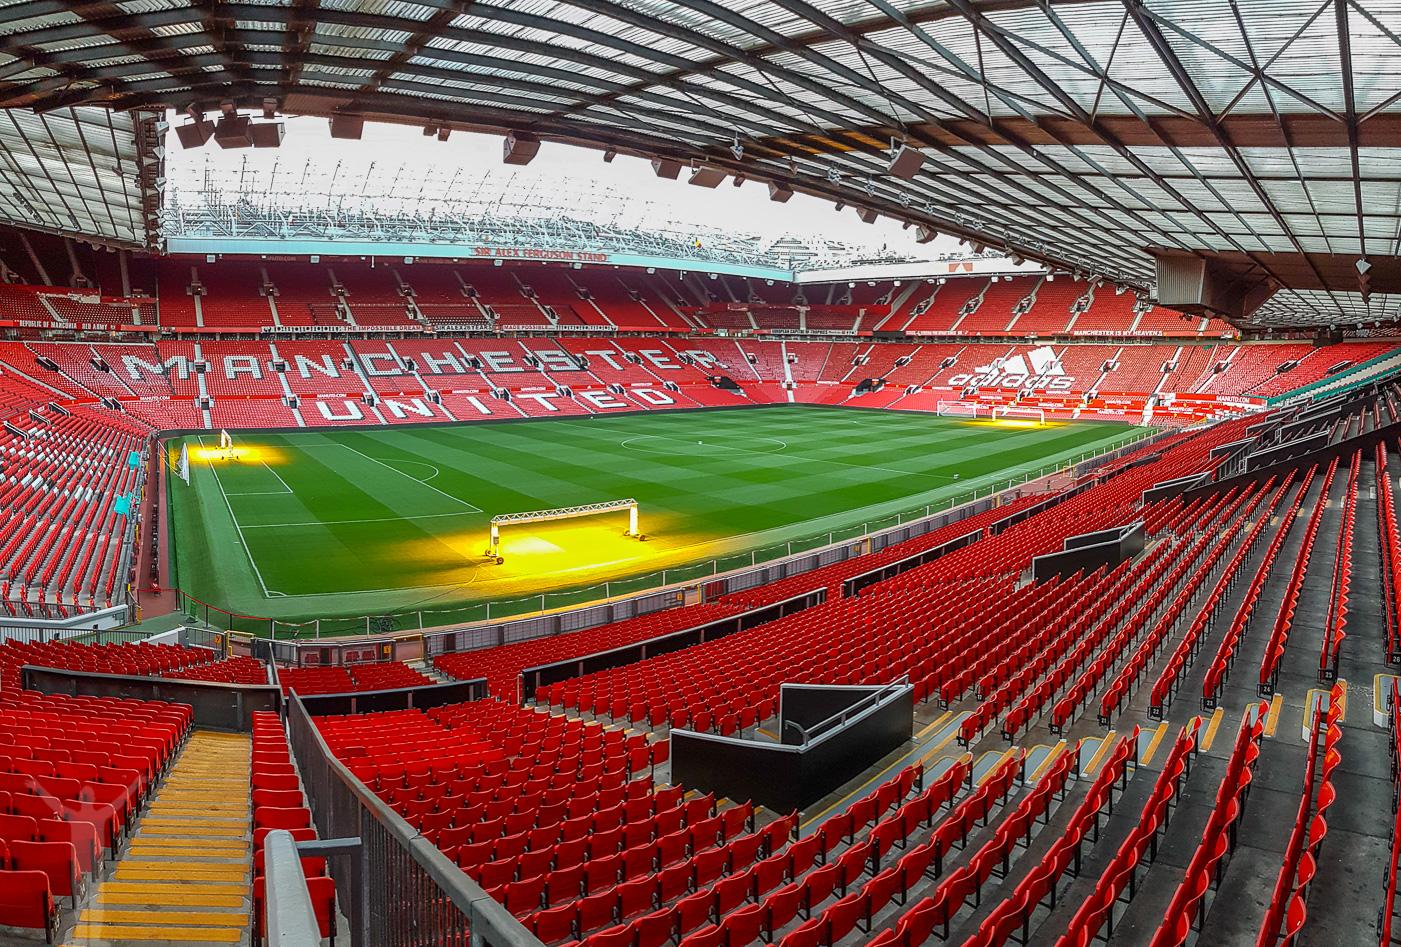 Panorama över Old Trafford, Manchester